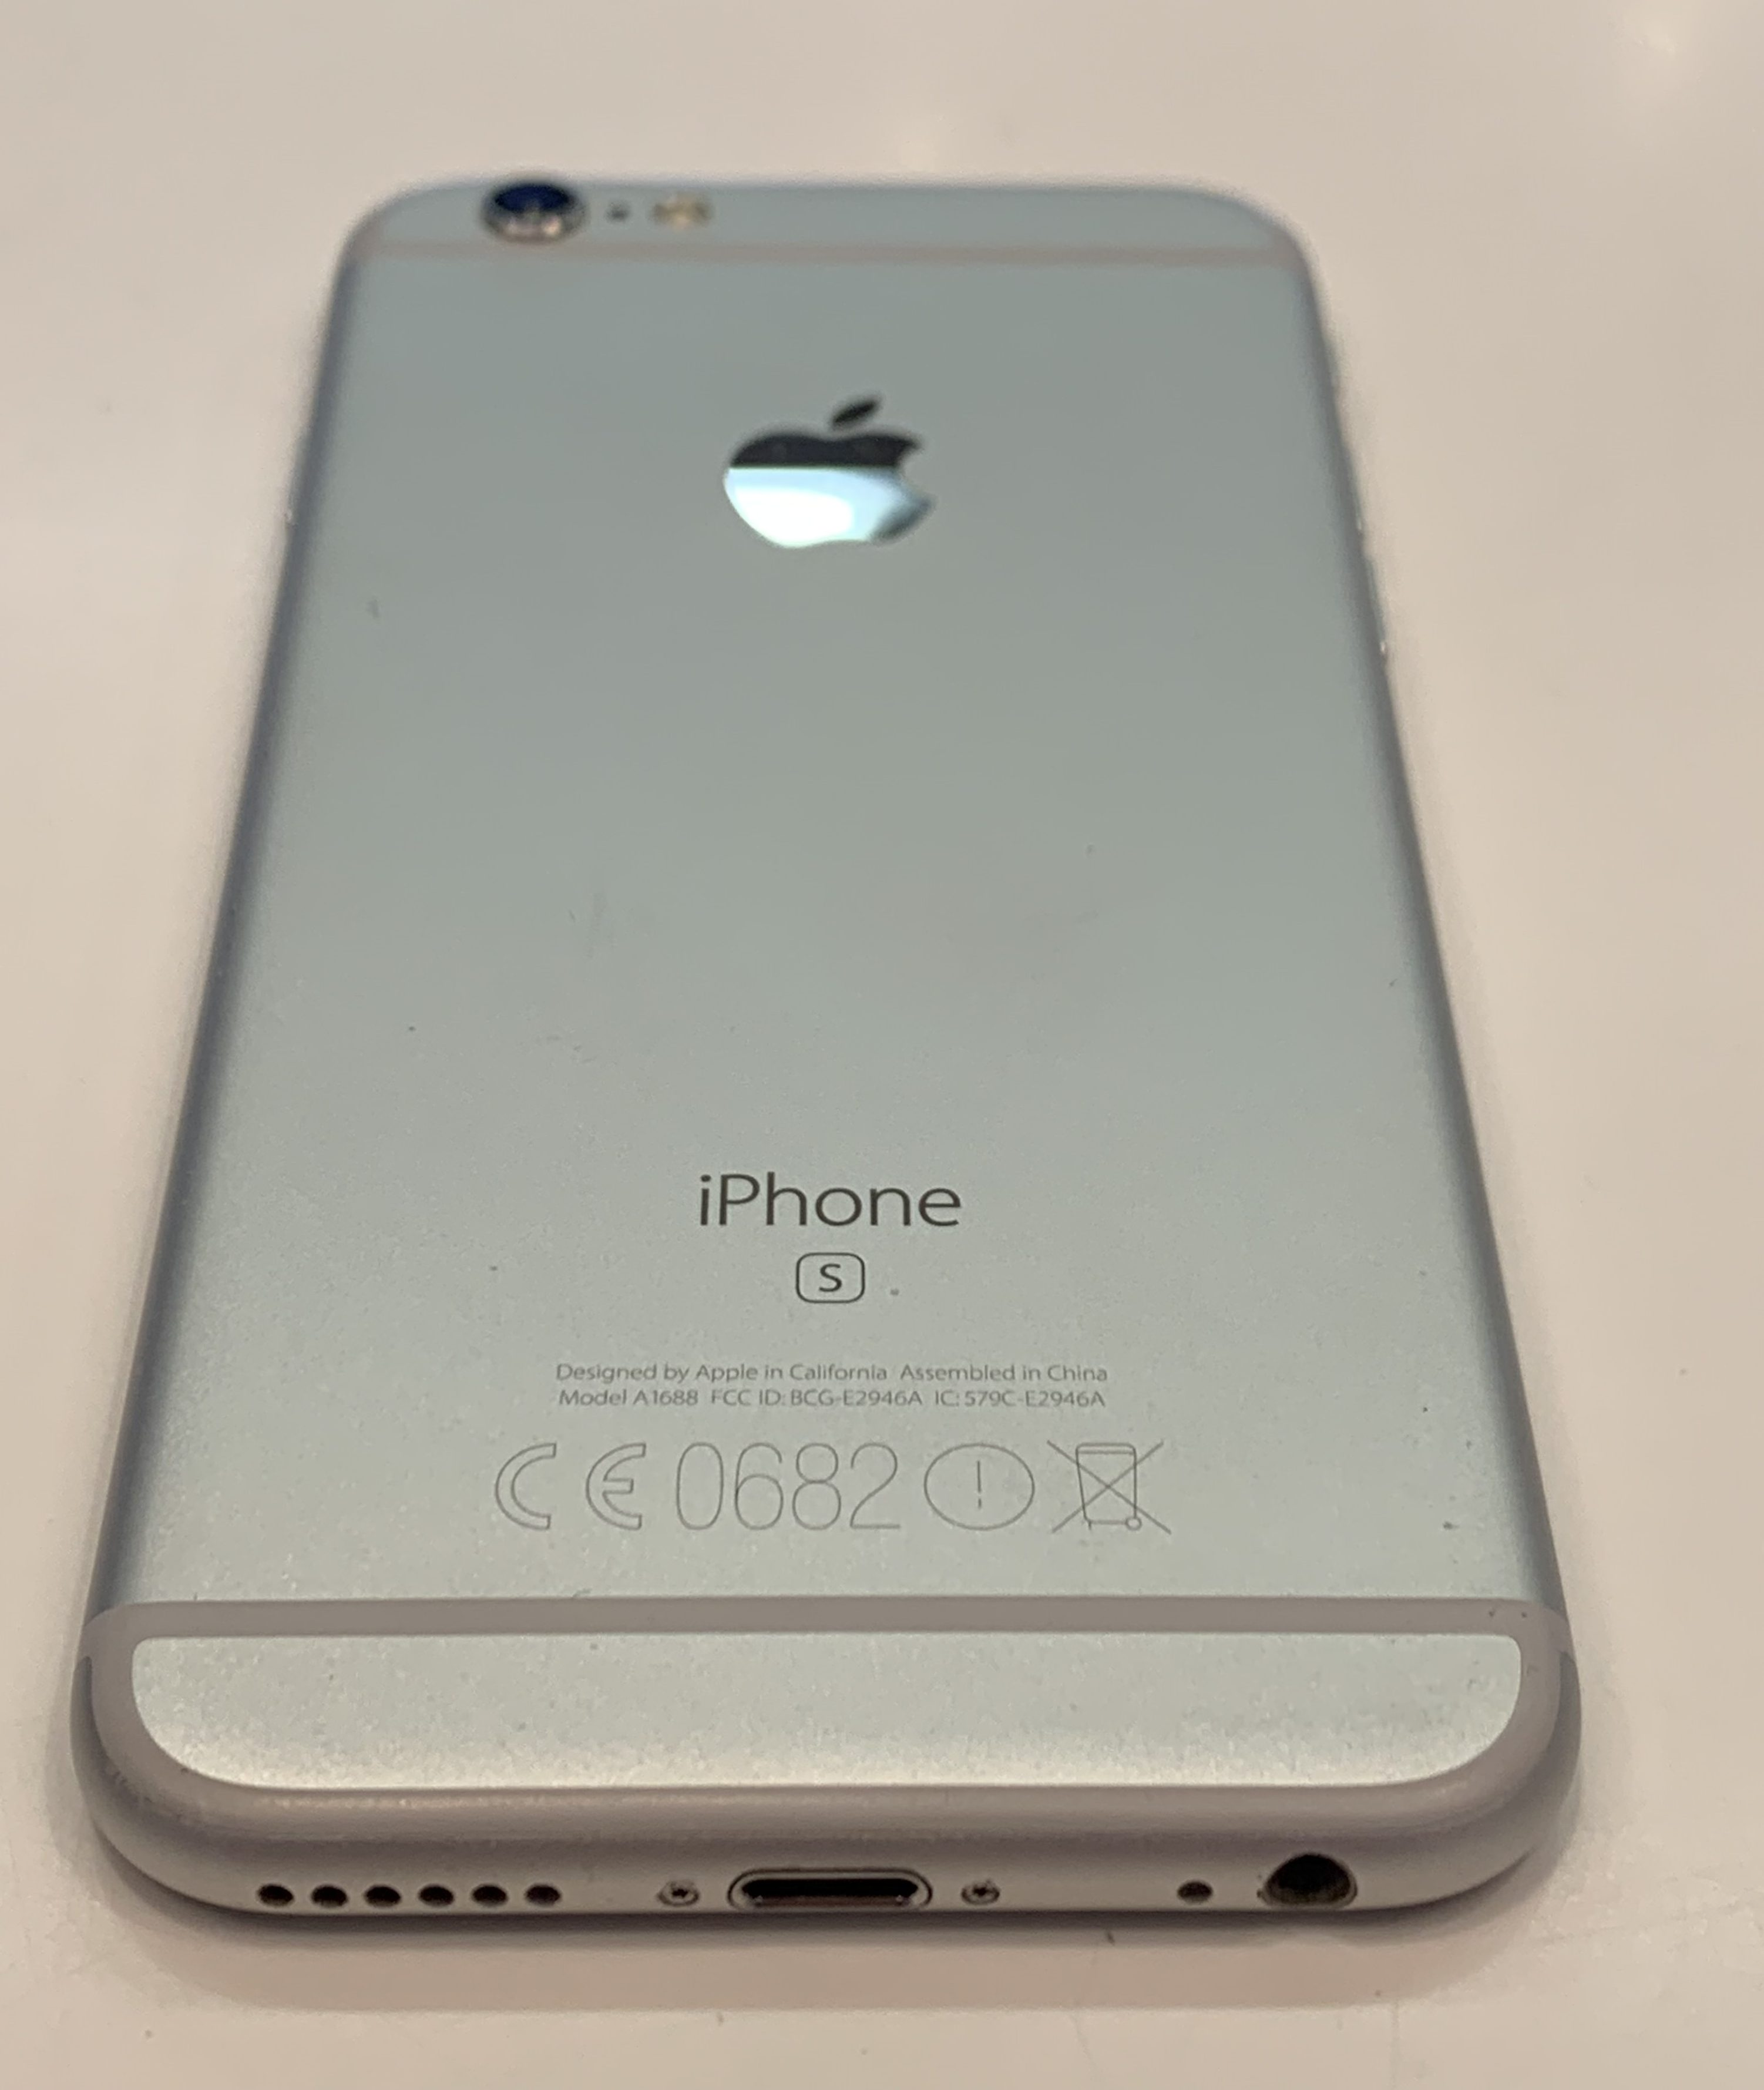 iPhone 6S 16GB, 16GB, Silver, imagen 2